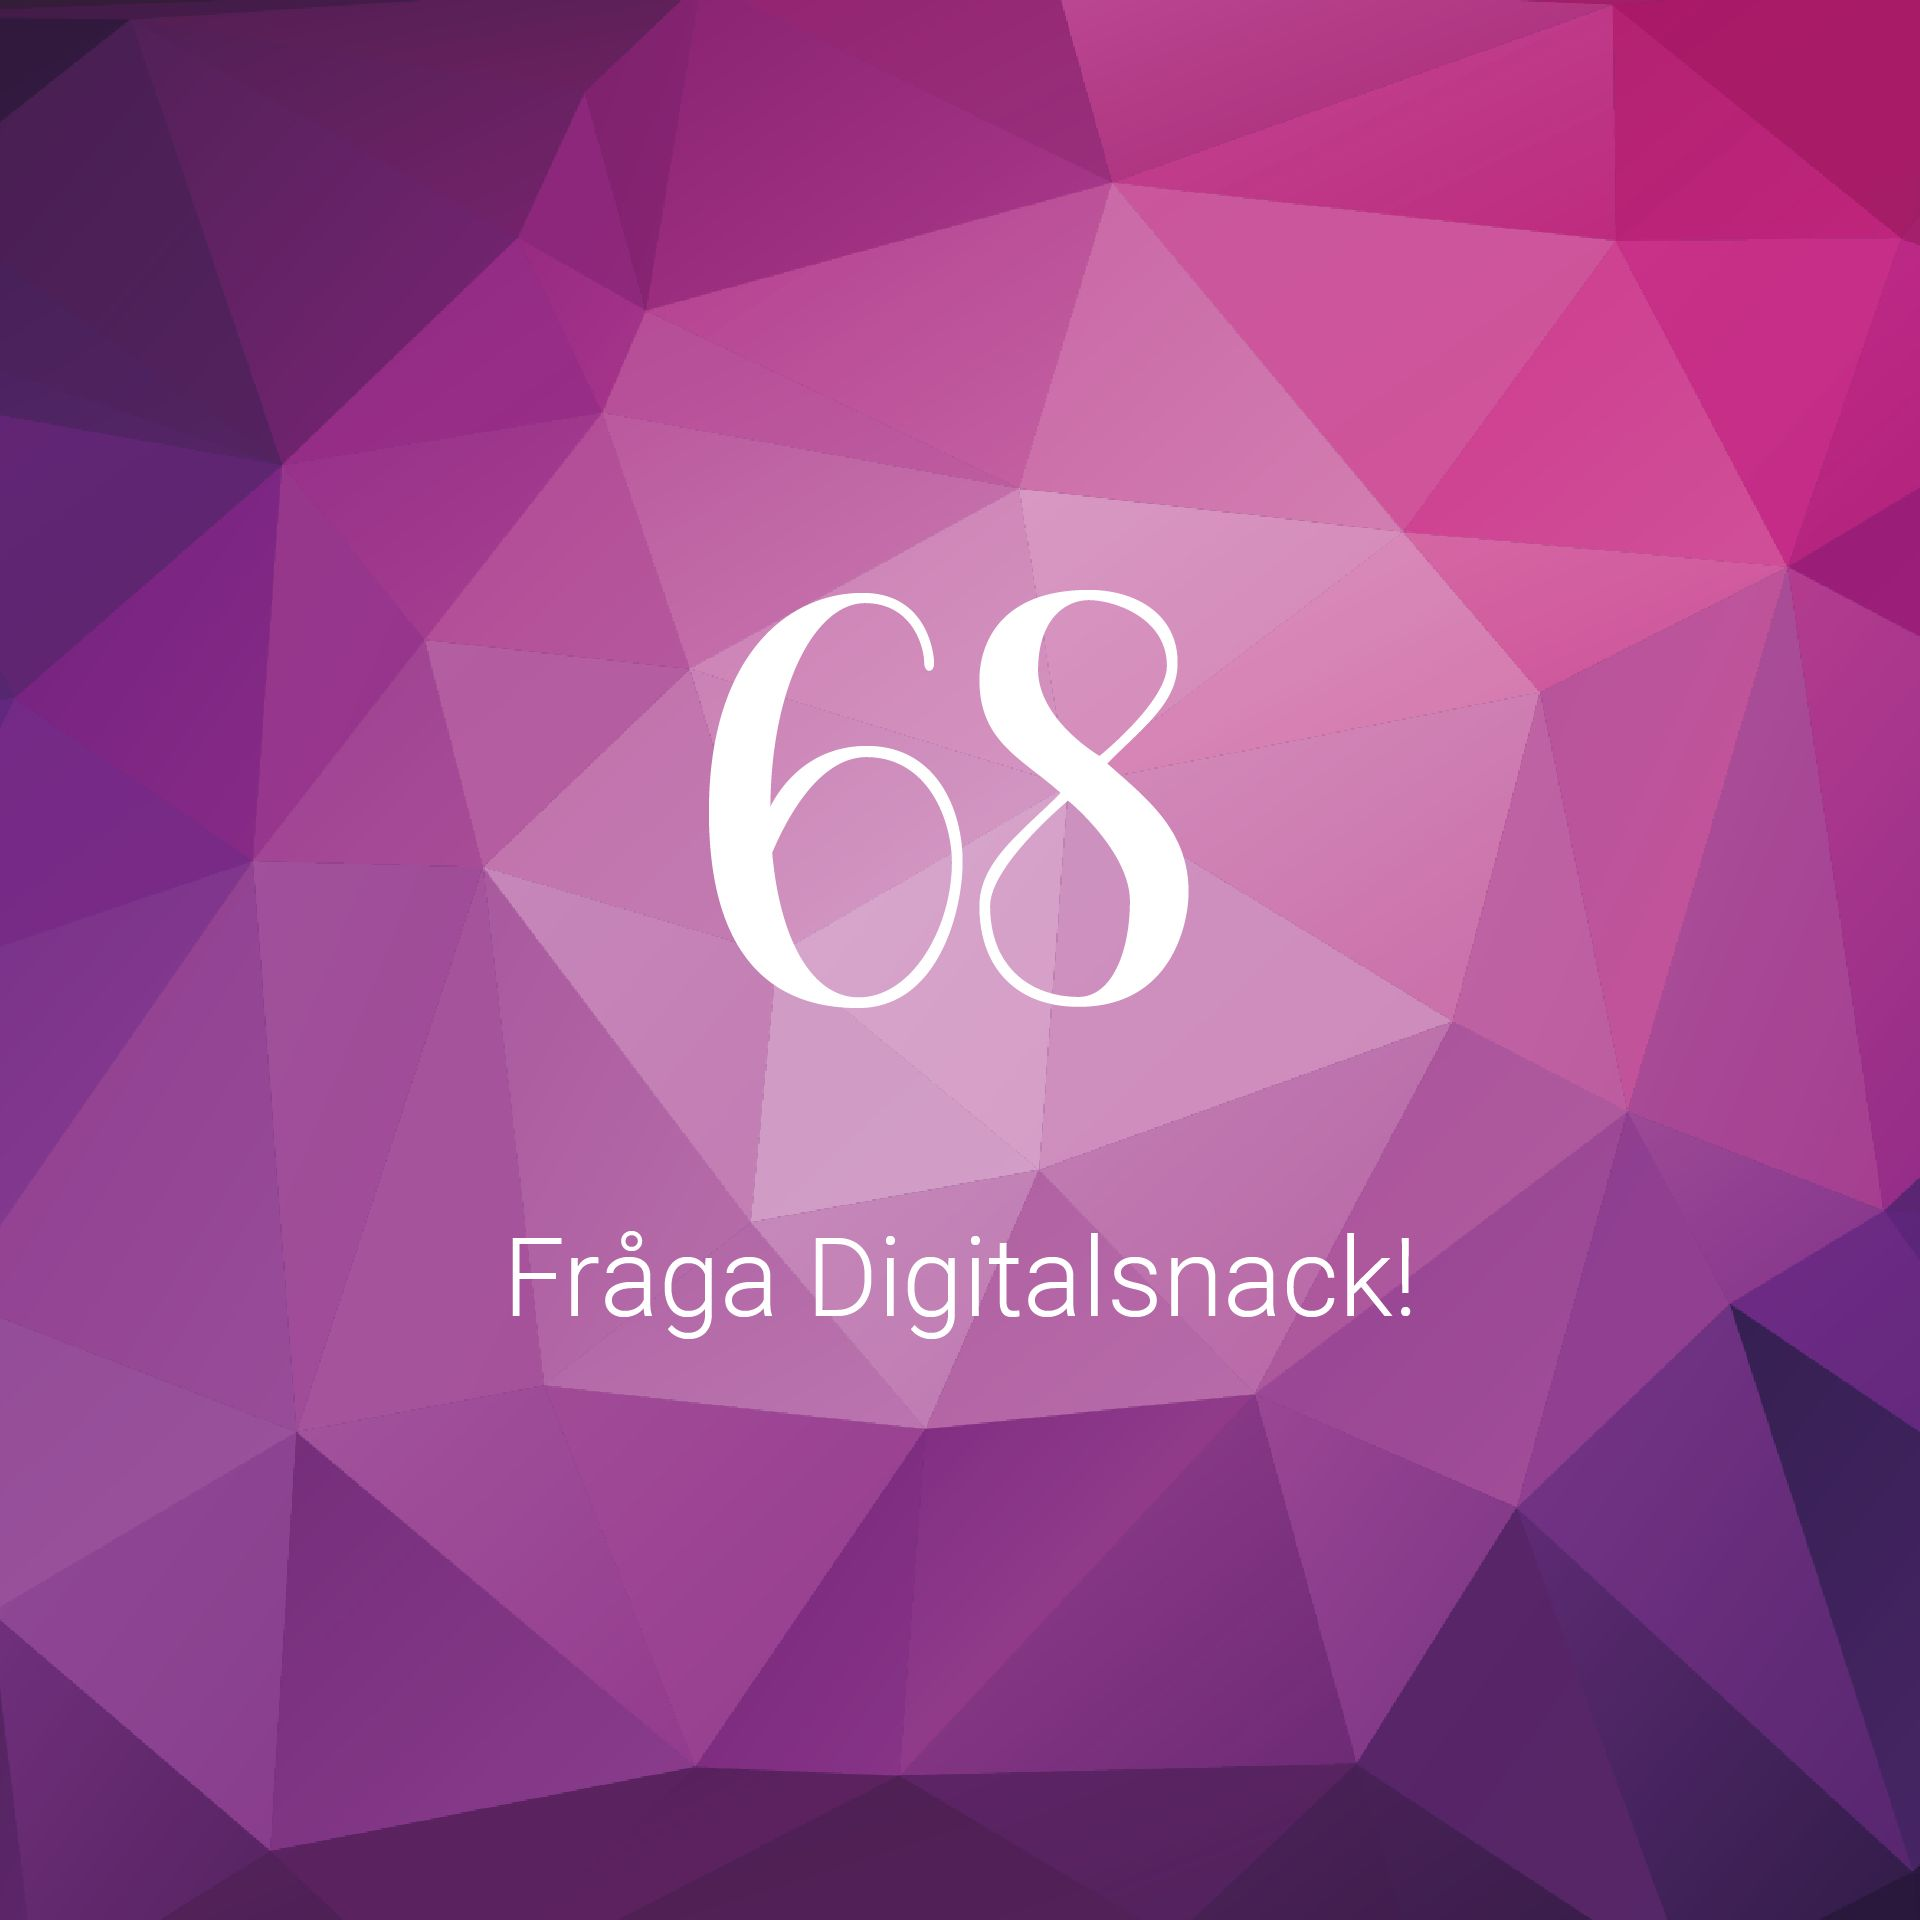 Digitalsnack